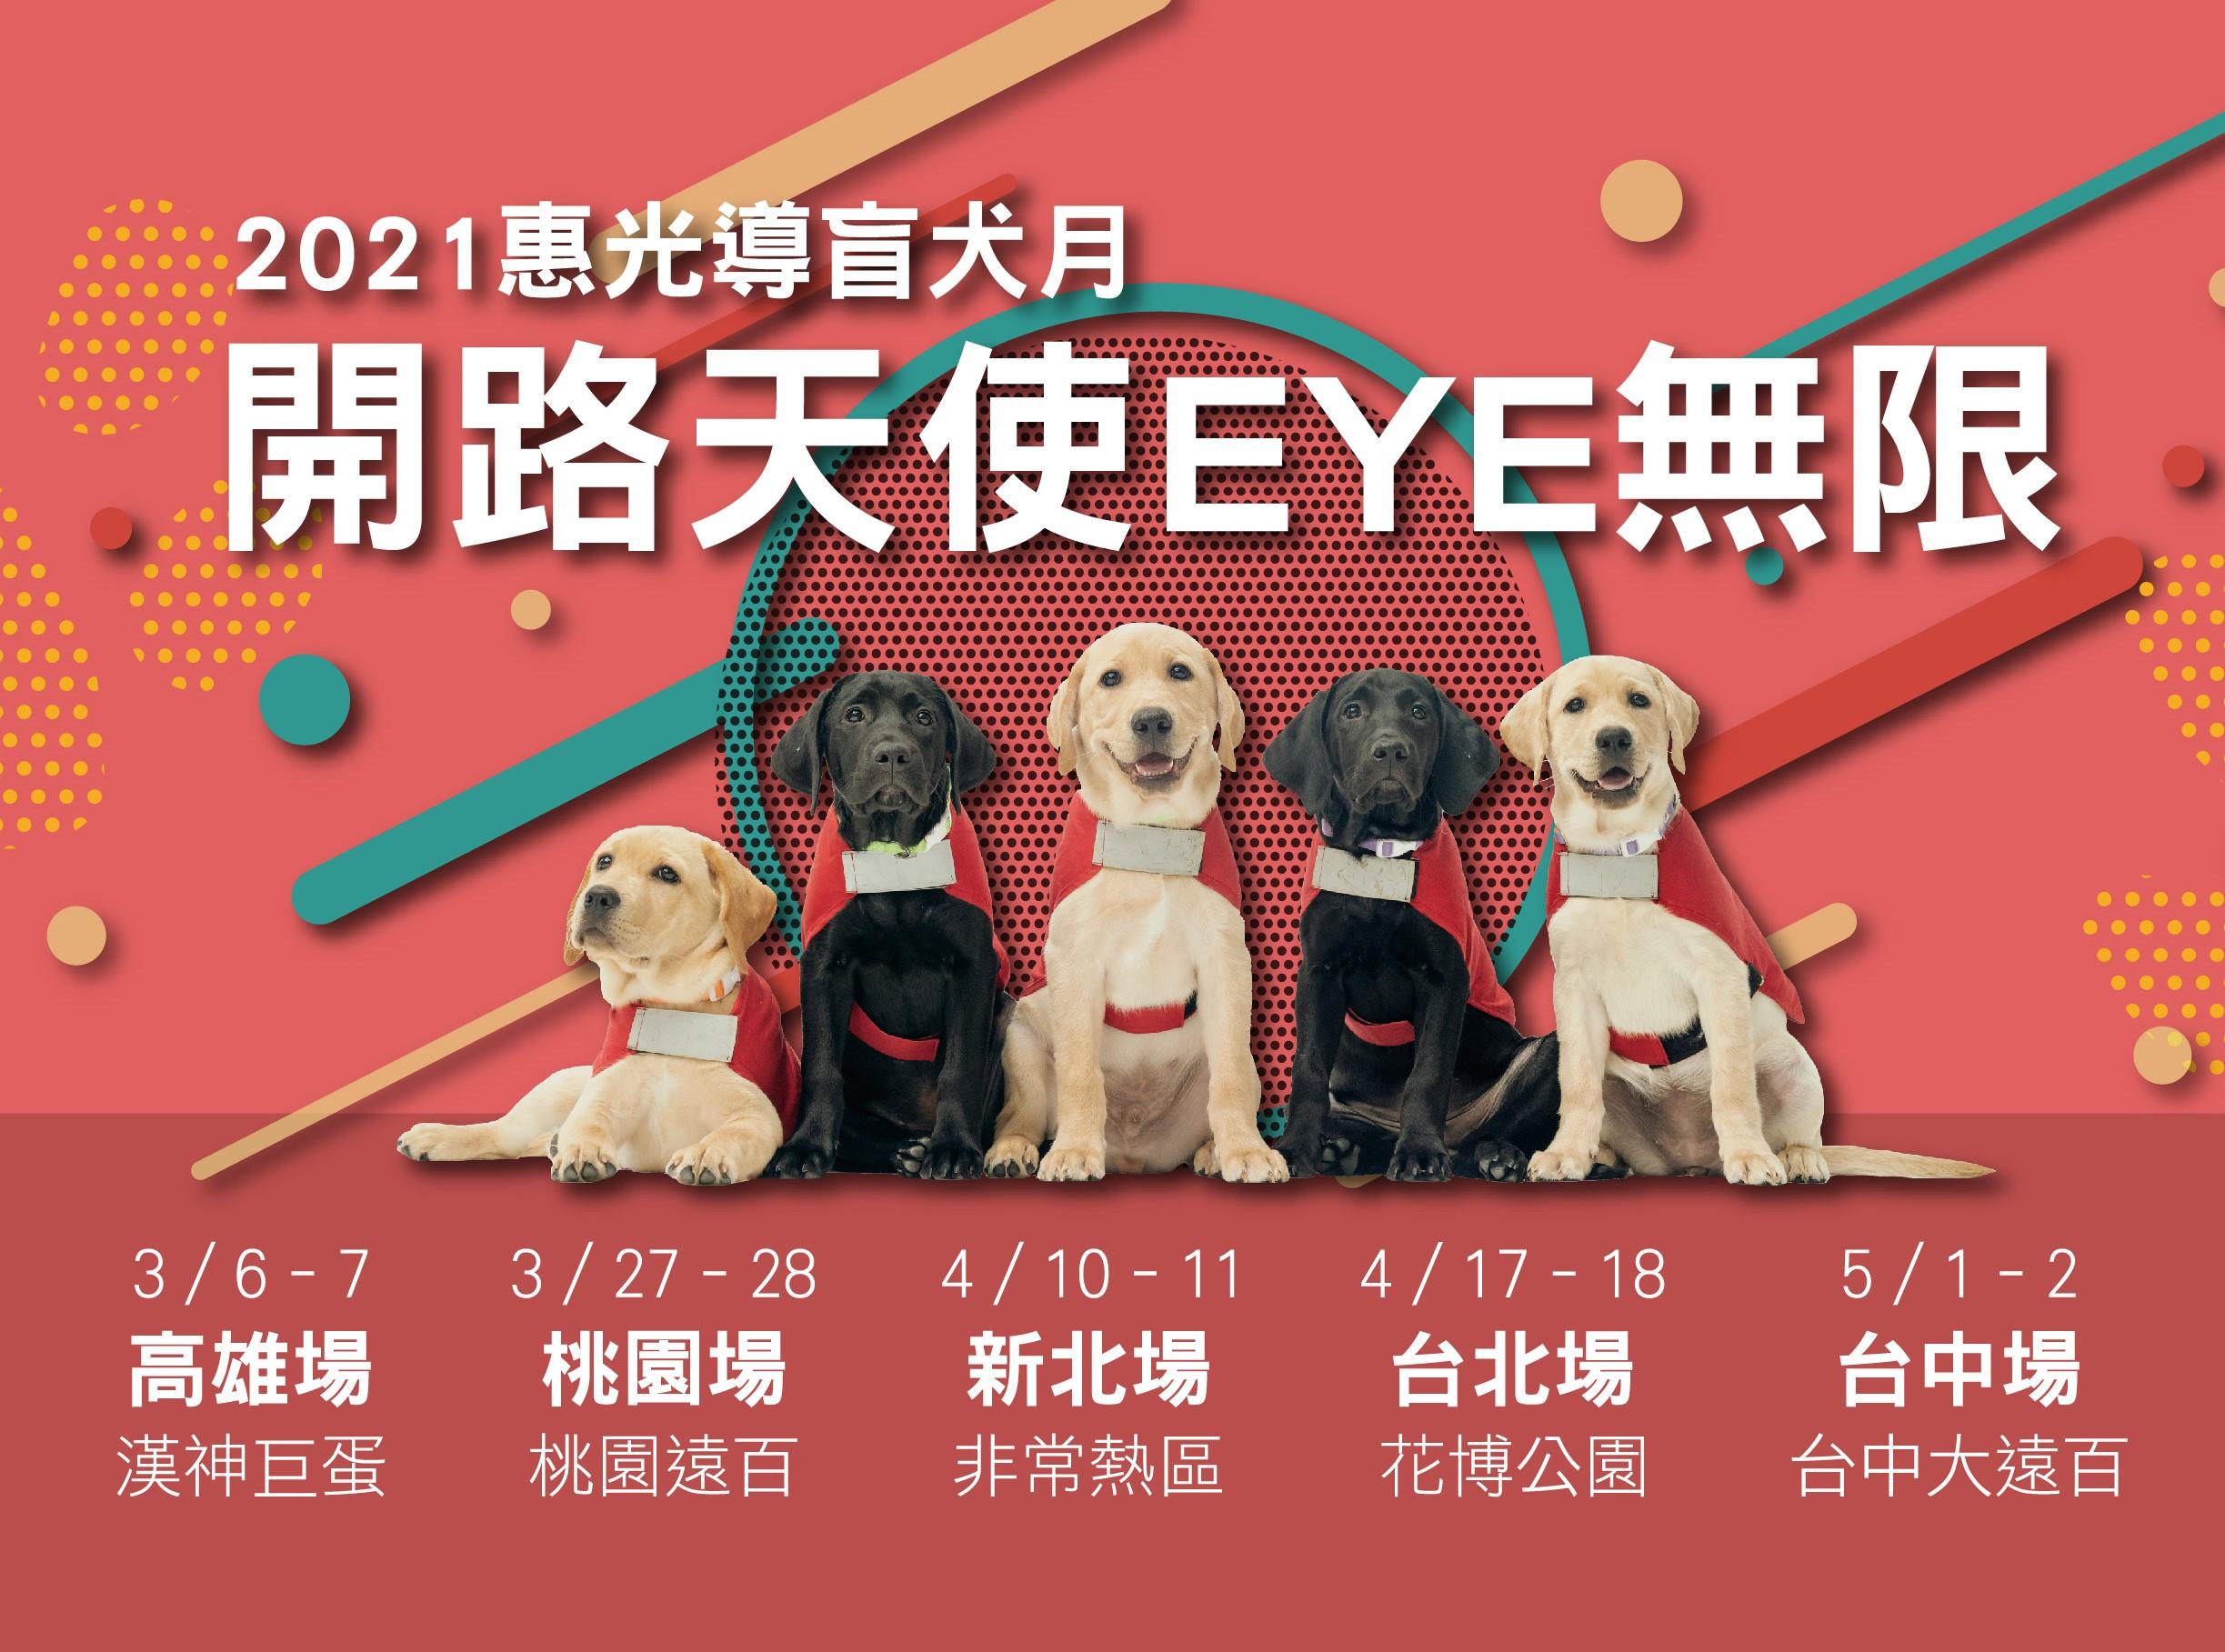 2021臉書Banner-2021導盲犬月_2018官網banner-謹賀新年.jpg